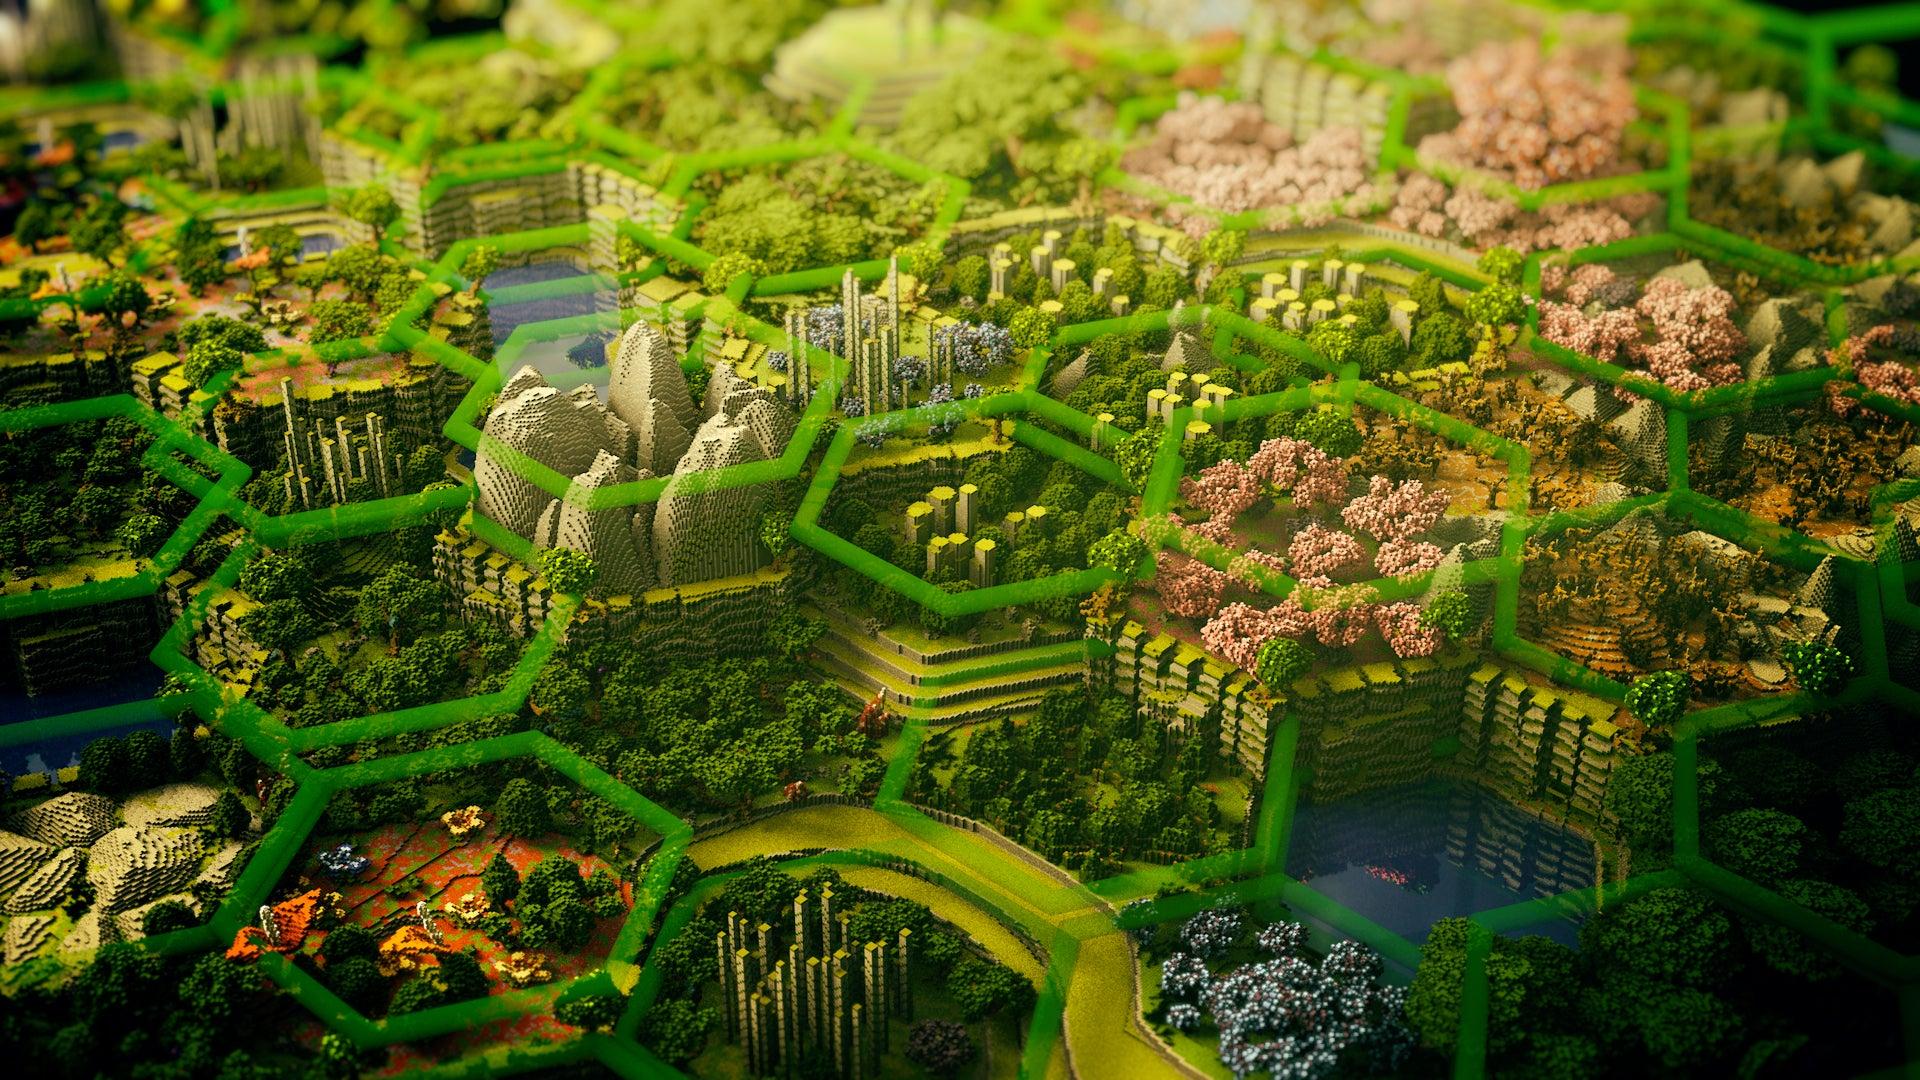 Minecraft Beautiful Garden enormous, beautiful minecraft map took 400 hours to build | kotaku